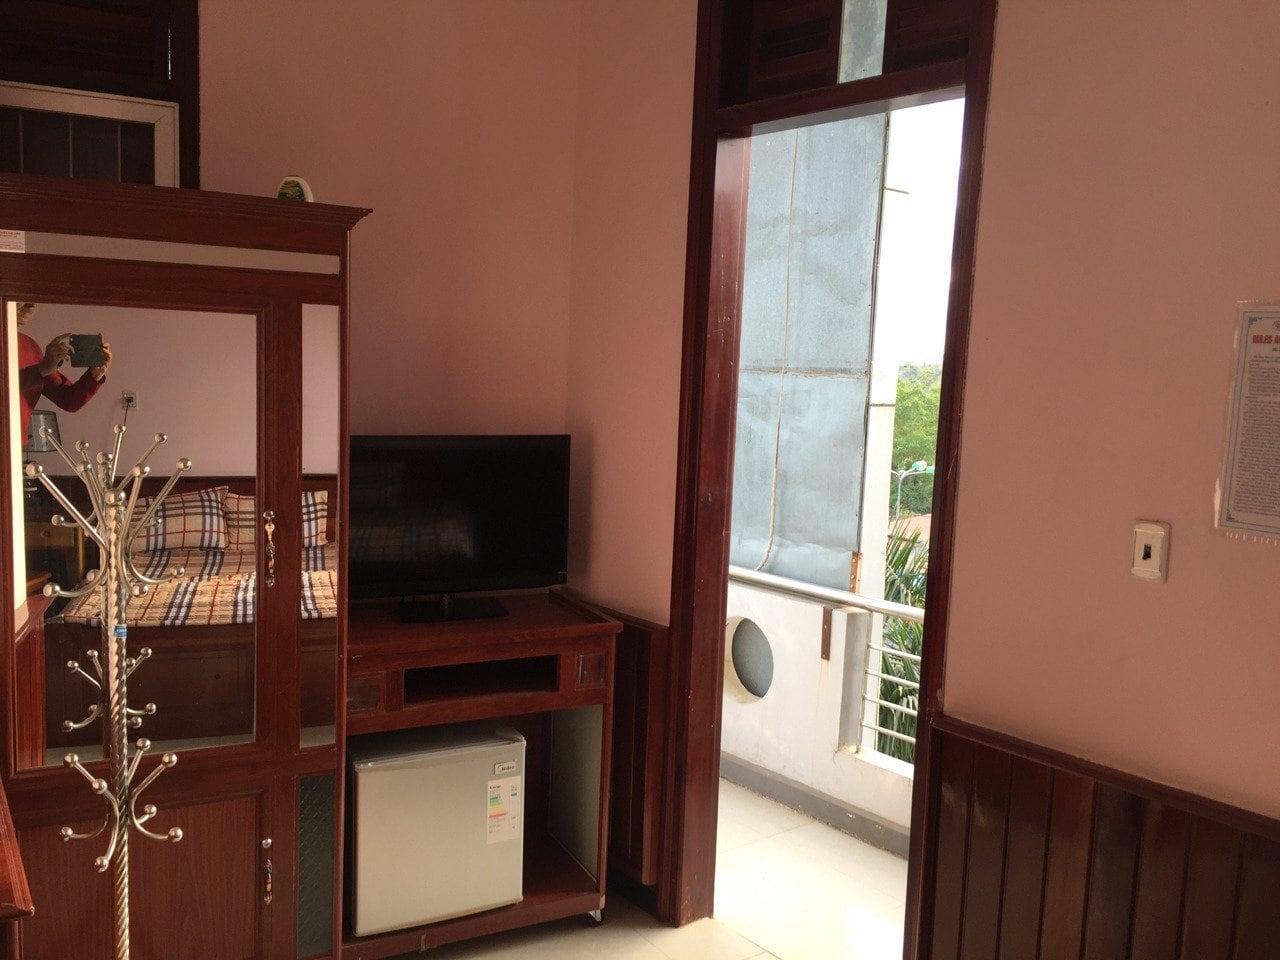 TV, fridge, closet and door to the balcony